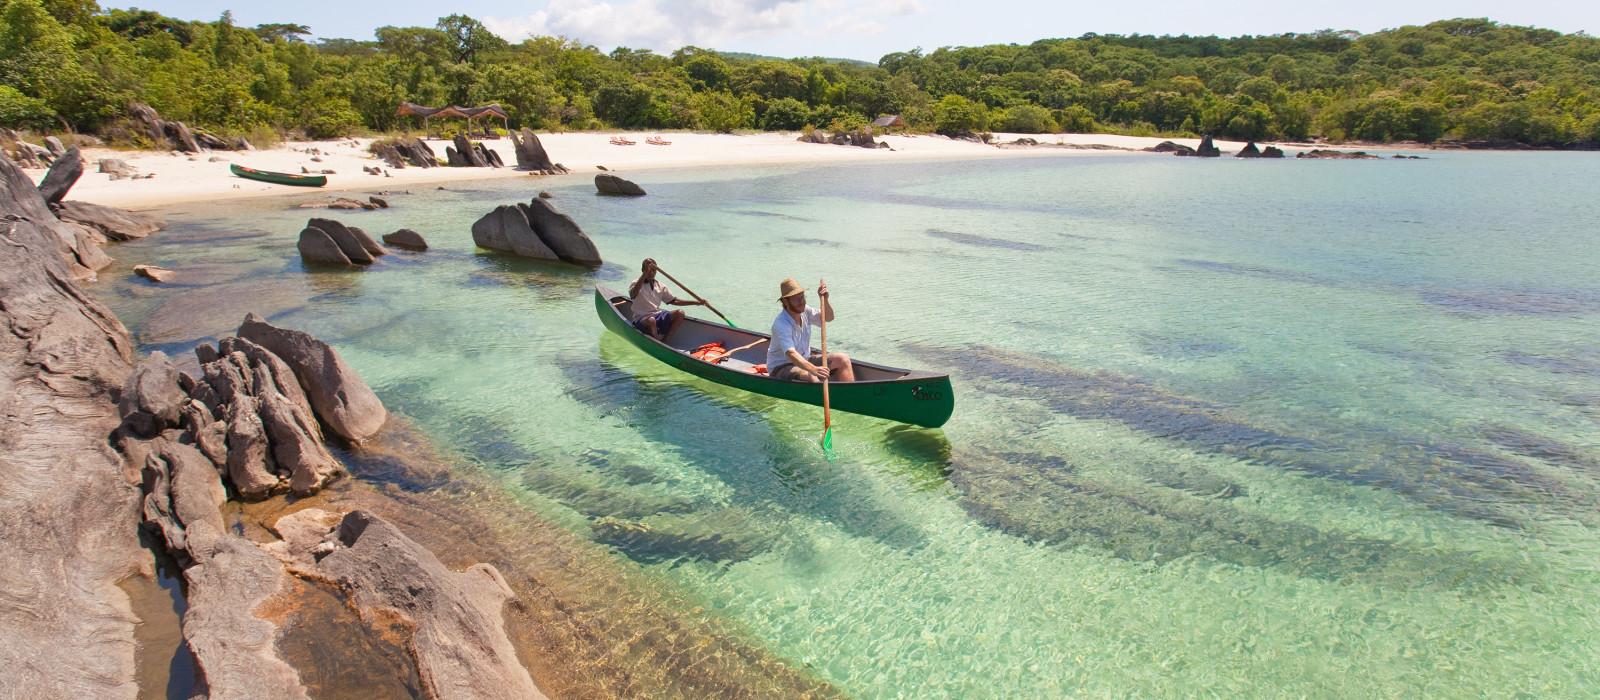 Cape Town, Safari and Indian Ocean Dreams Tour Trip 1